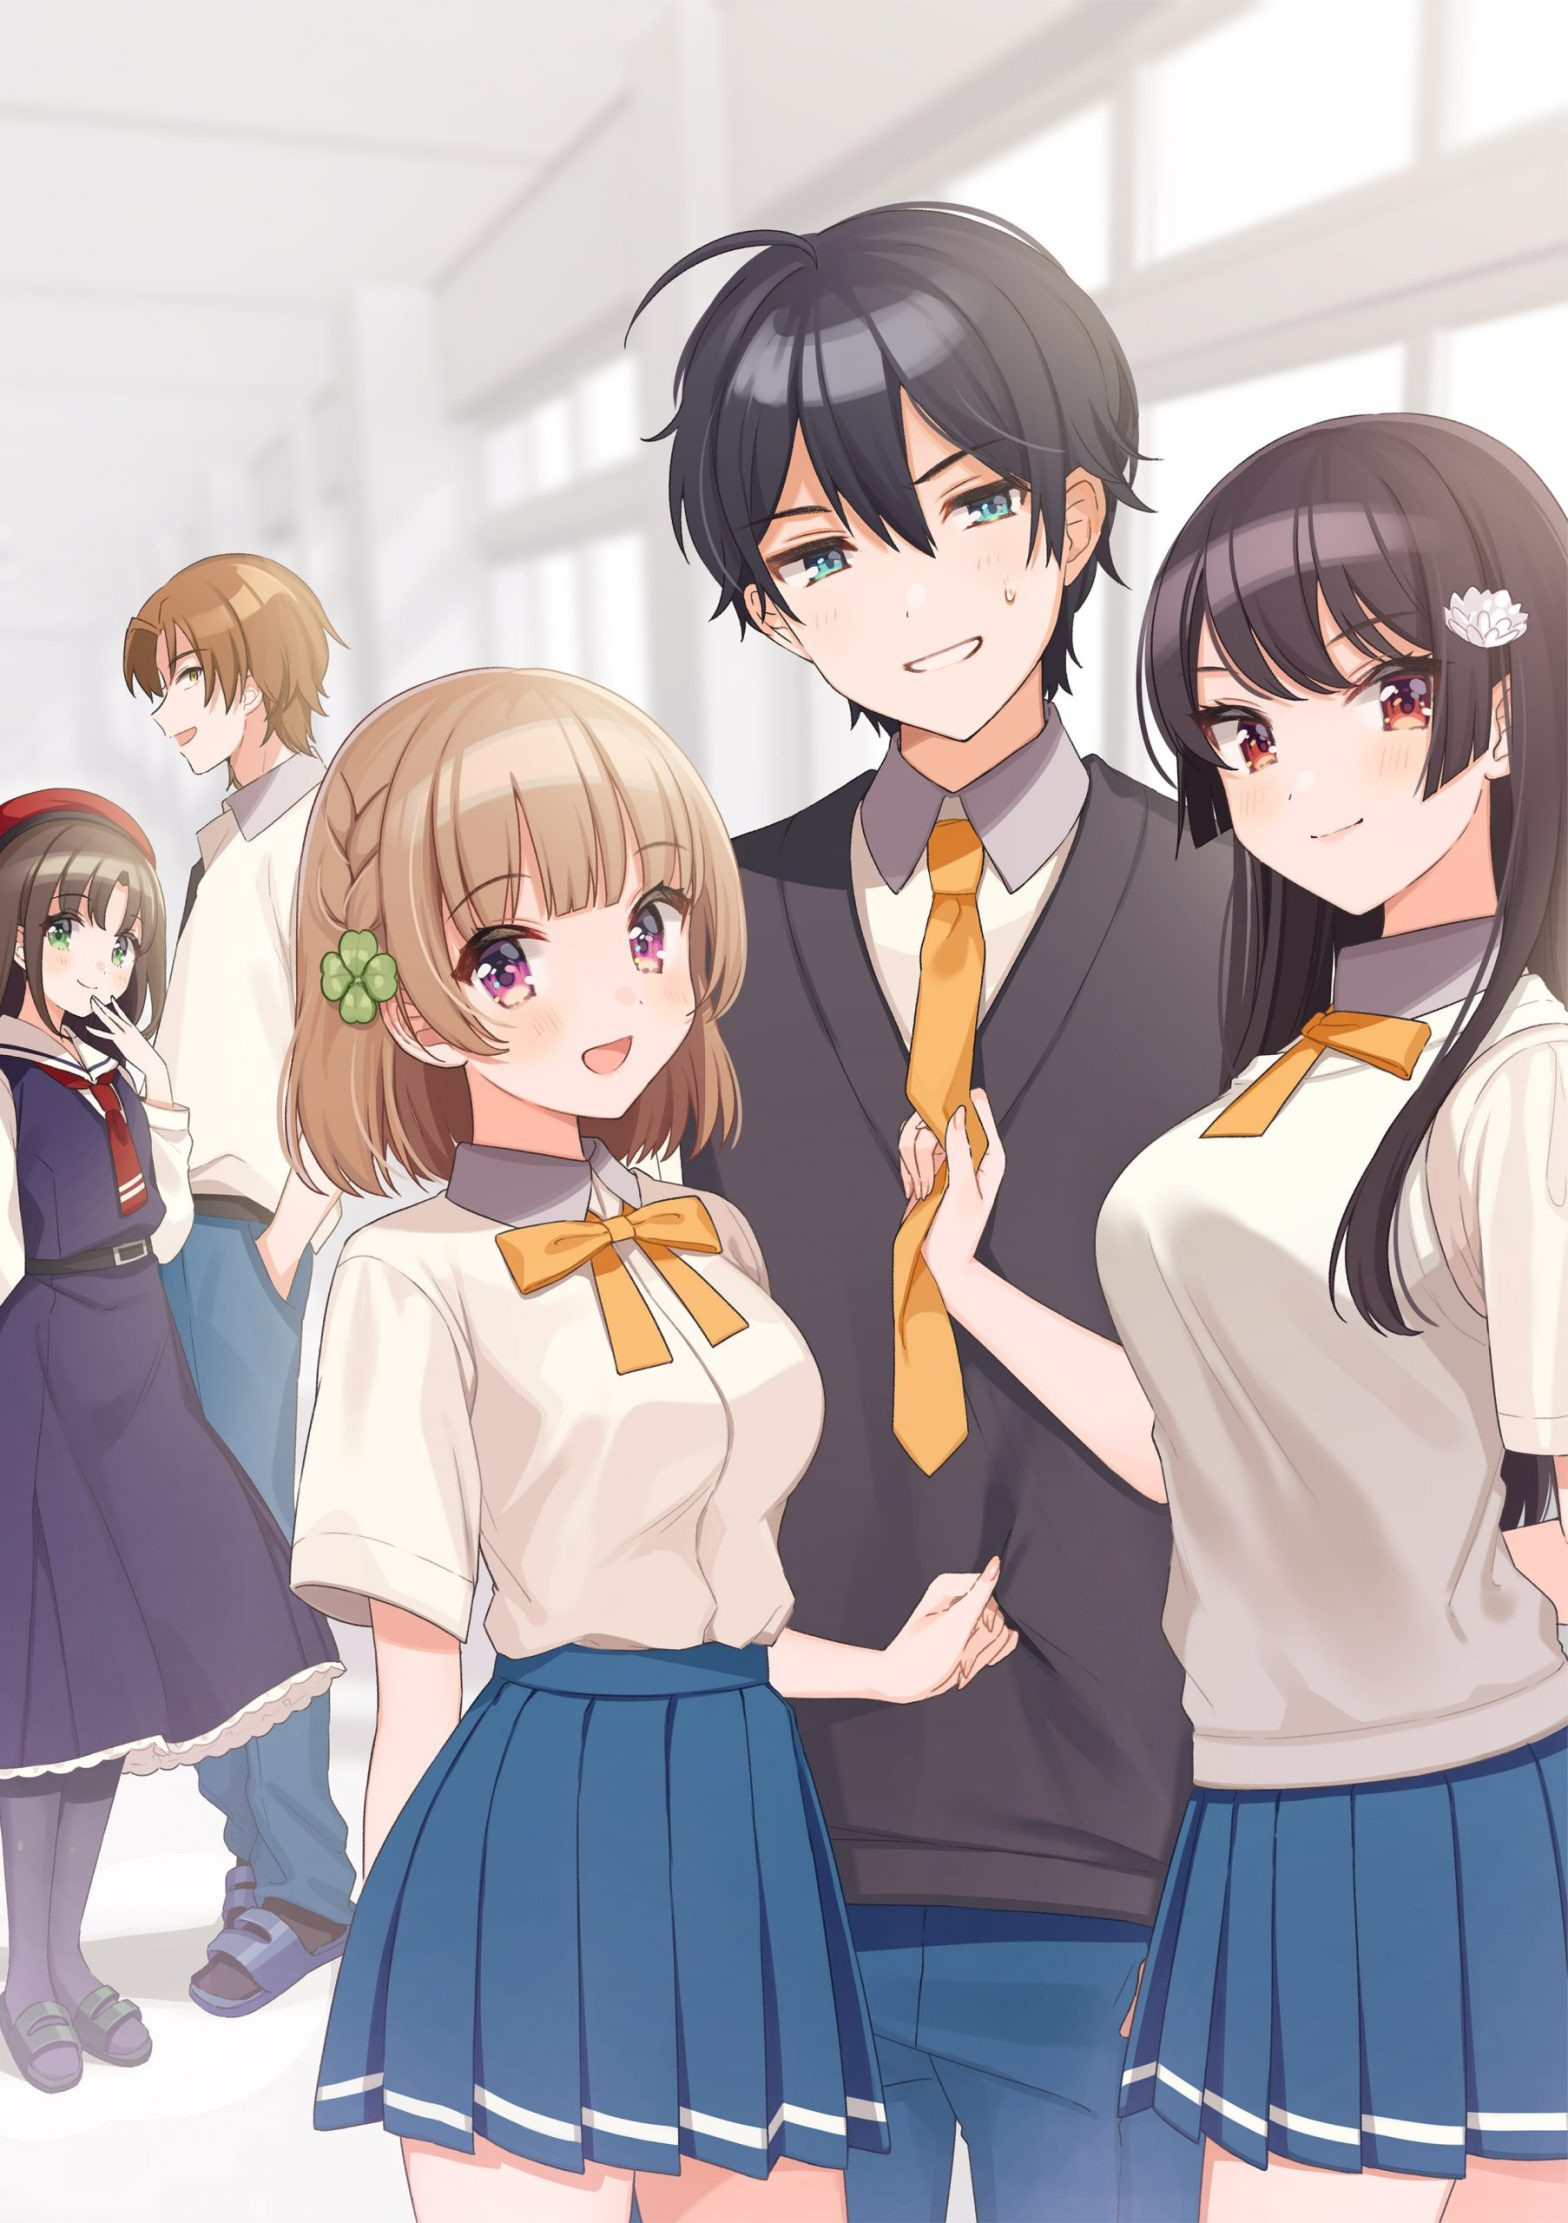 Osananajimi ga Zettai ni Makenai Love Come anime coming in 2021 - anime news - anime premieres next year - anime recommendations